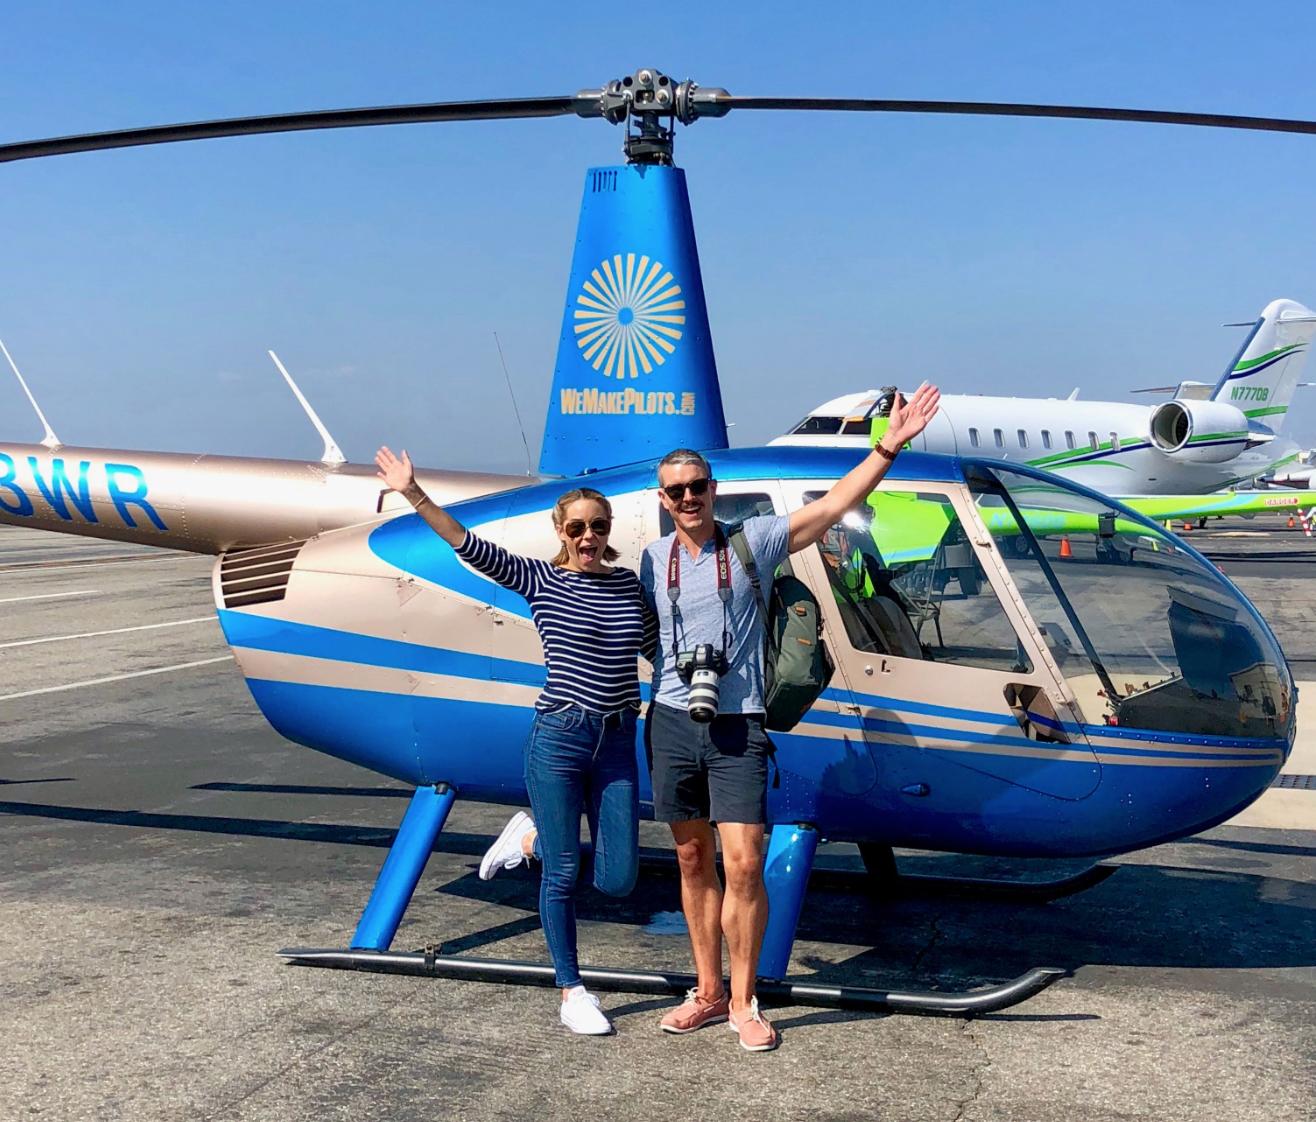 Treasure Island Laguna Beach: Travel Guide: Lauren Conrad's Guide To Laguna Beach